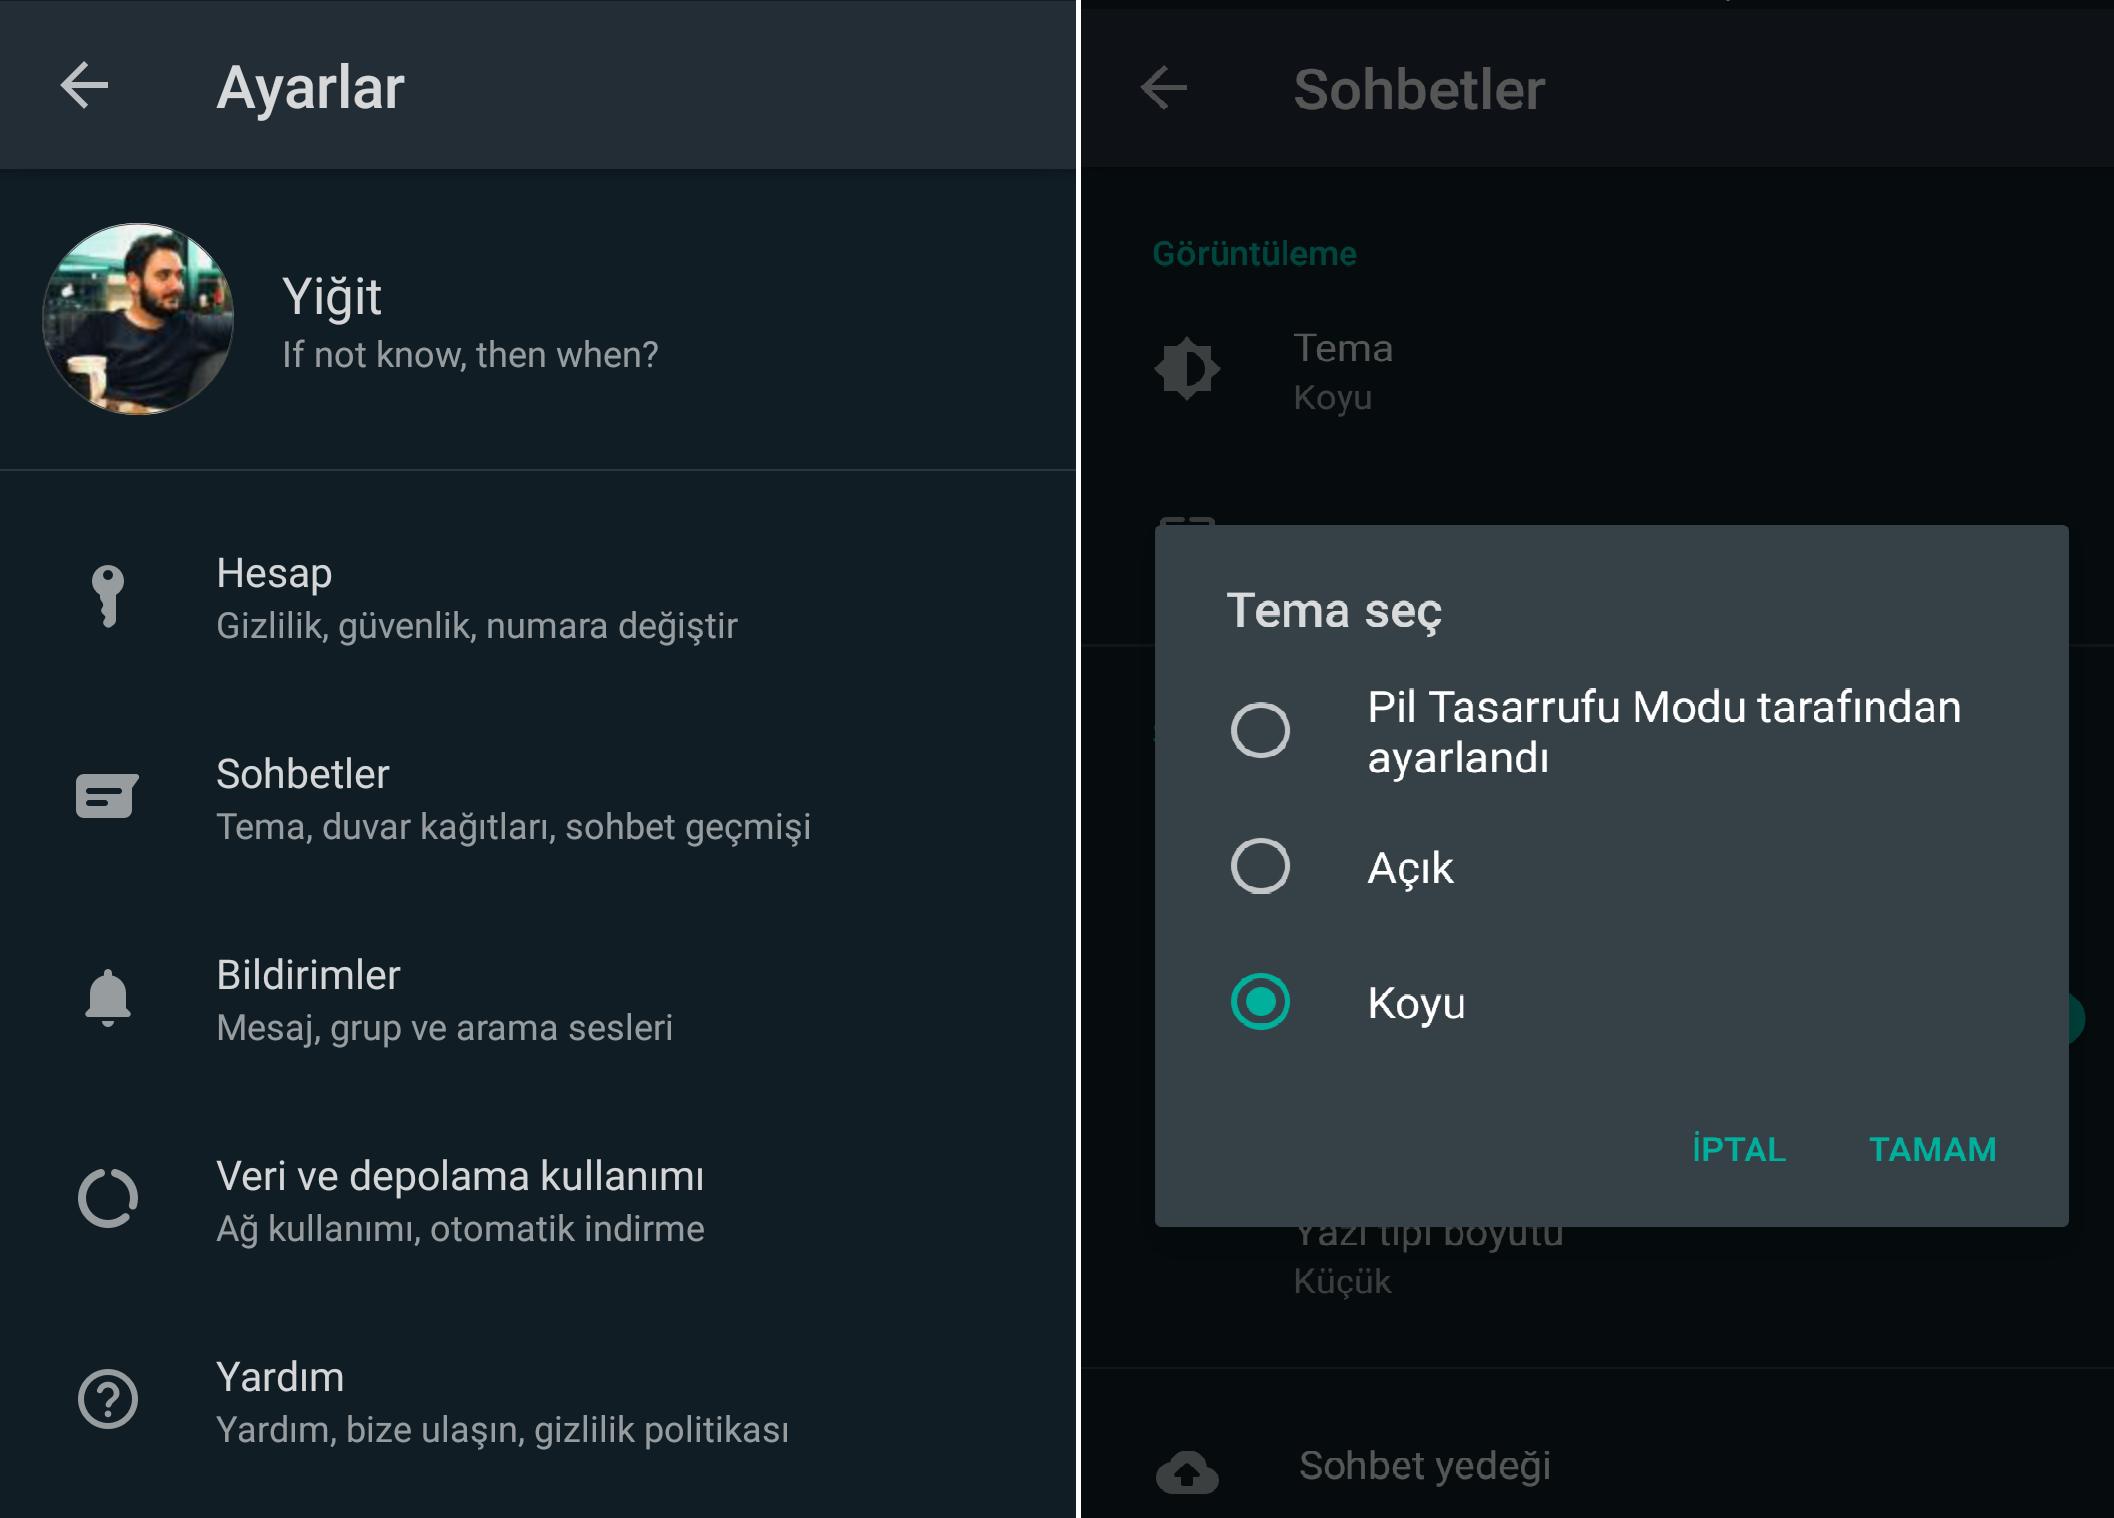 whatsappin-android-beta-surumune-karanlik-mod-geldi-2